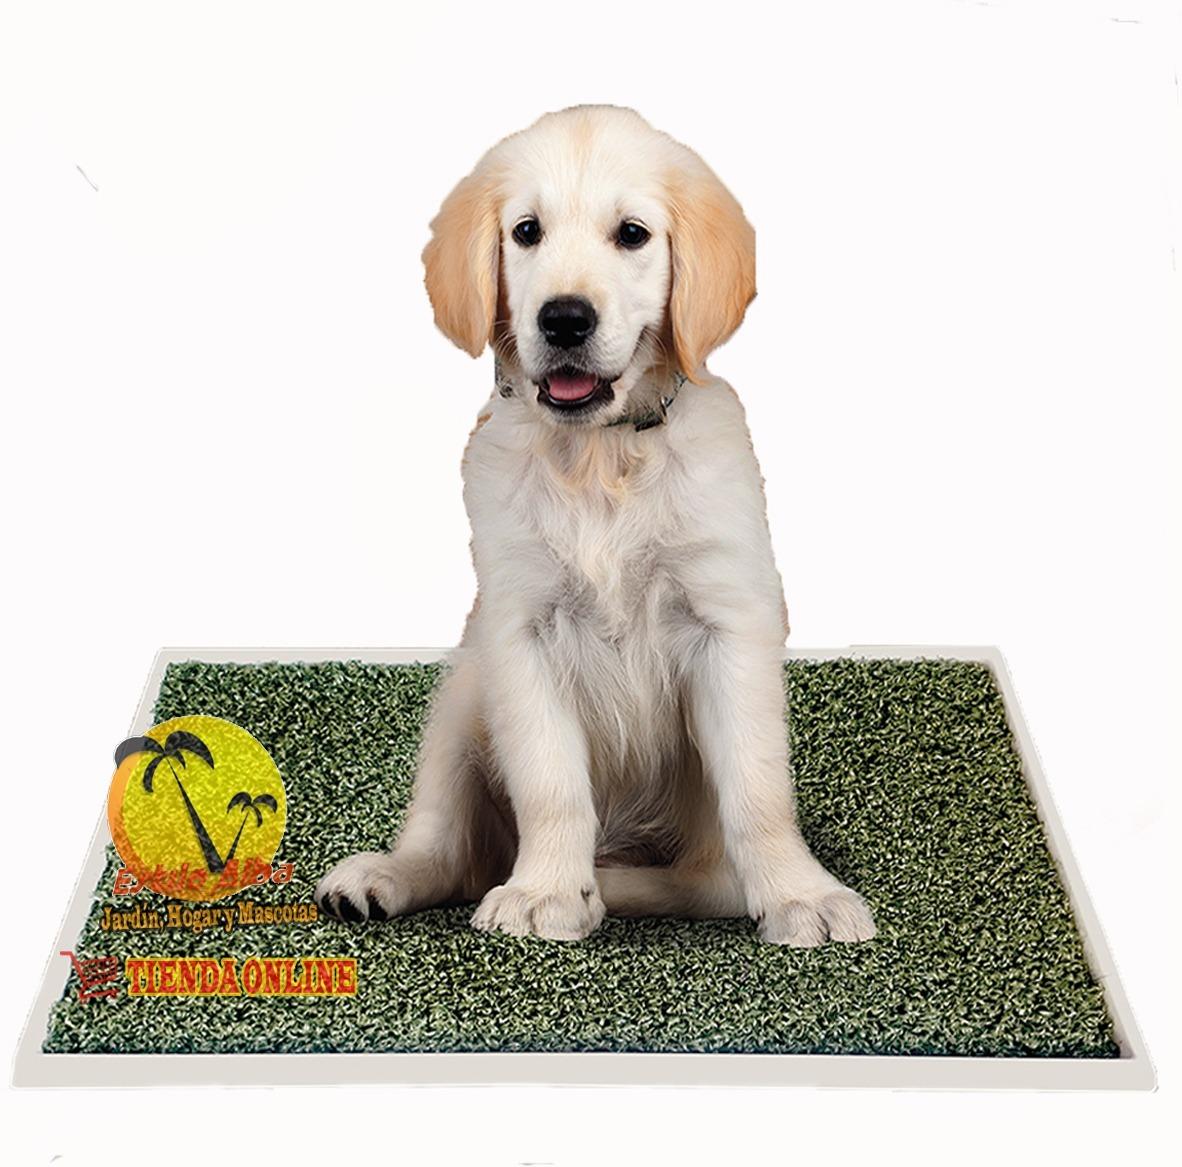 Bandeja Sanitaria Pañopet® Carpet Max 70 X 55 Cm + 5 Paños - $ 2.200,00 en Mercado Libre